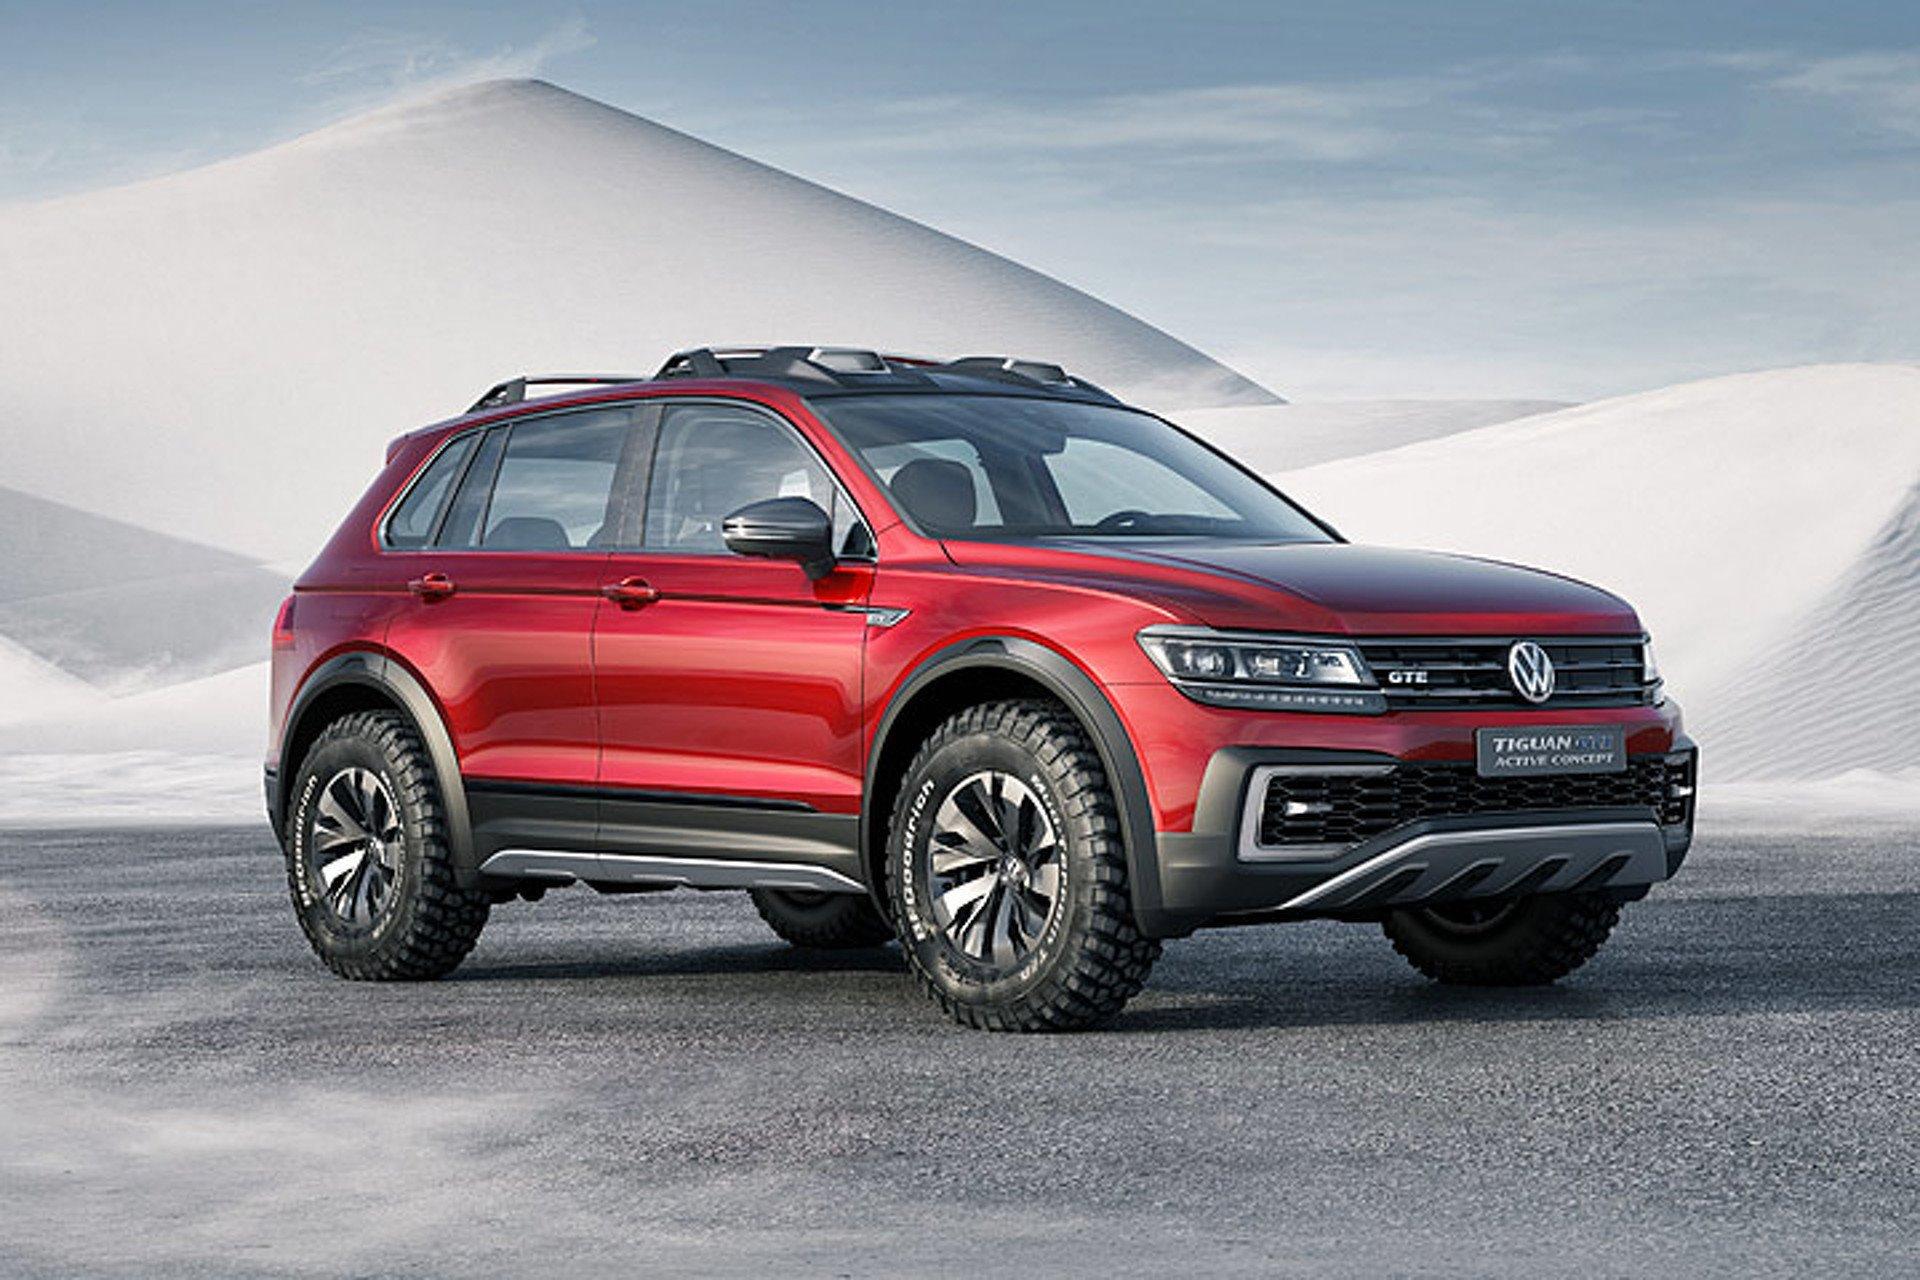 New 2019 Volkswagen-Tiguan 2.0T SEL Premium 4Motion Tiguan 2.0T SEL Premium 4Motion for sale $37,195 at M and V Leasing in Brooklyn NY 11223 1